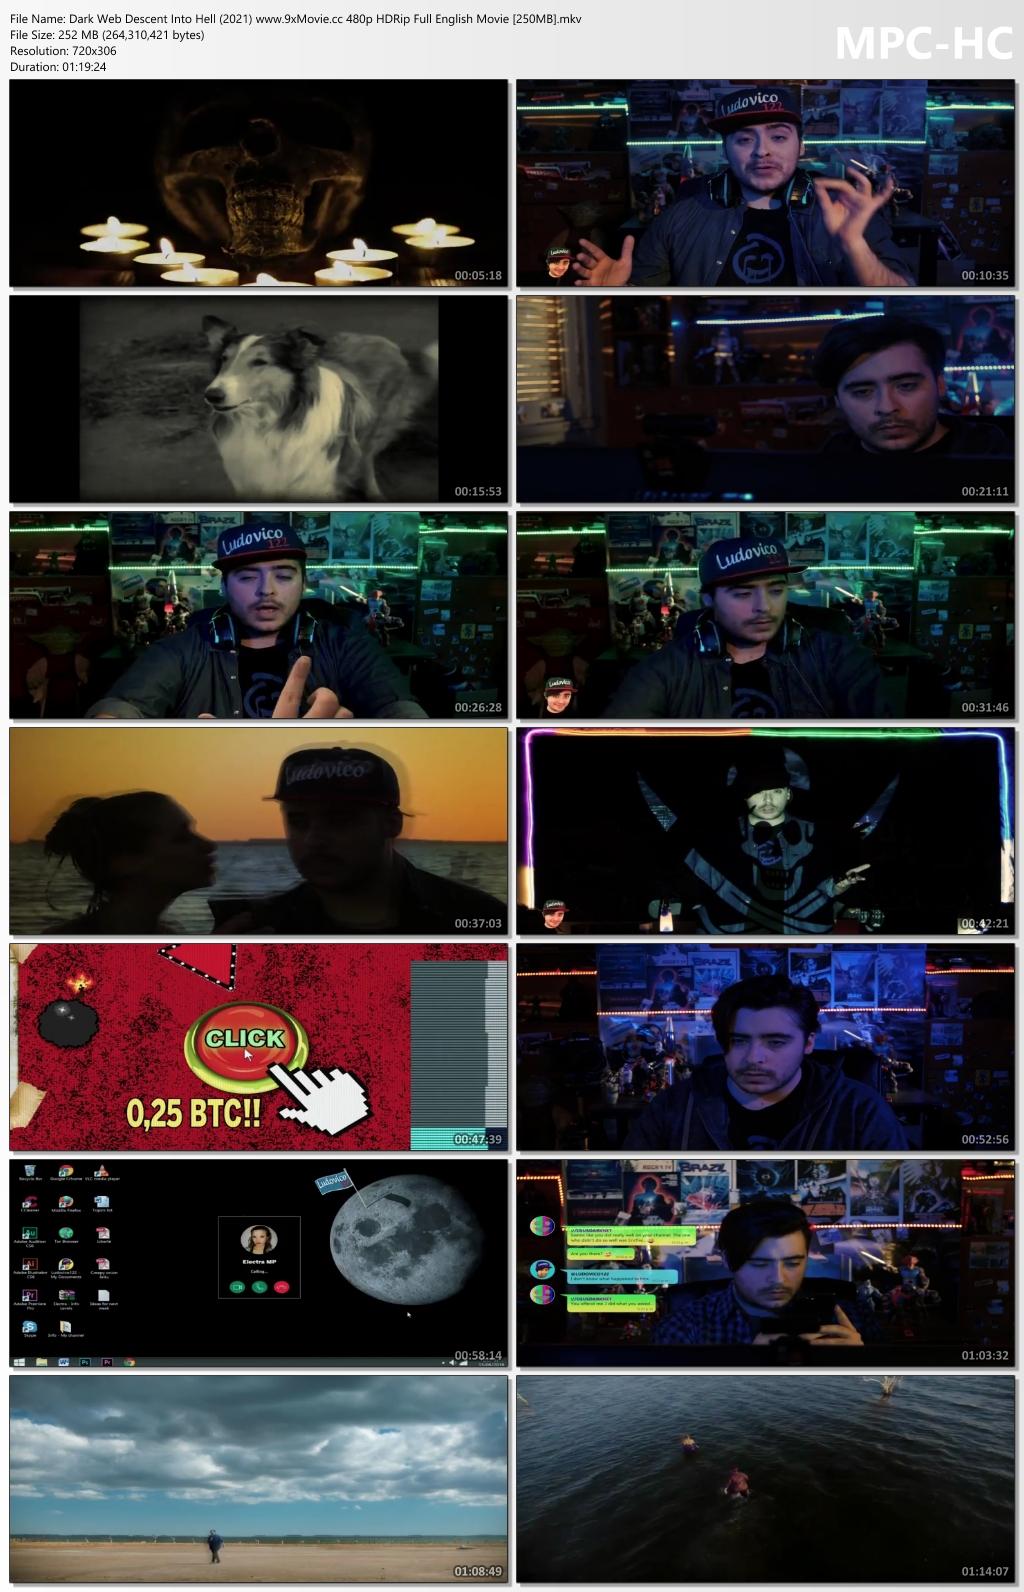 Dark-Web-Descent-Into-Hell-2021-www-9x-Movie-cc-480p-HDRip-Full-English-Movie-250-MB-mkv